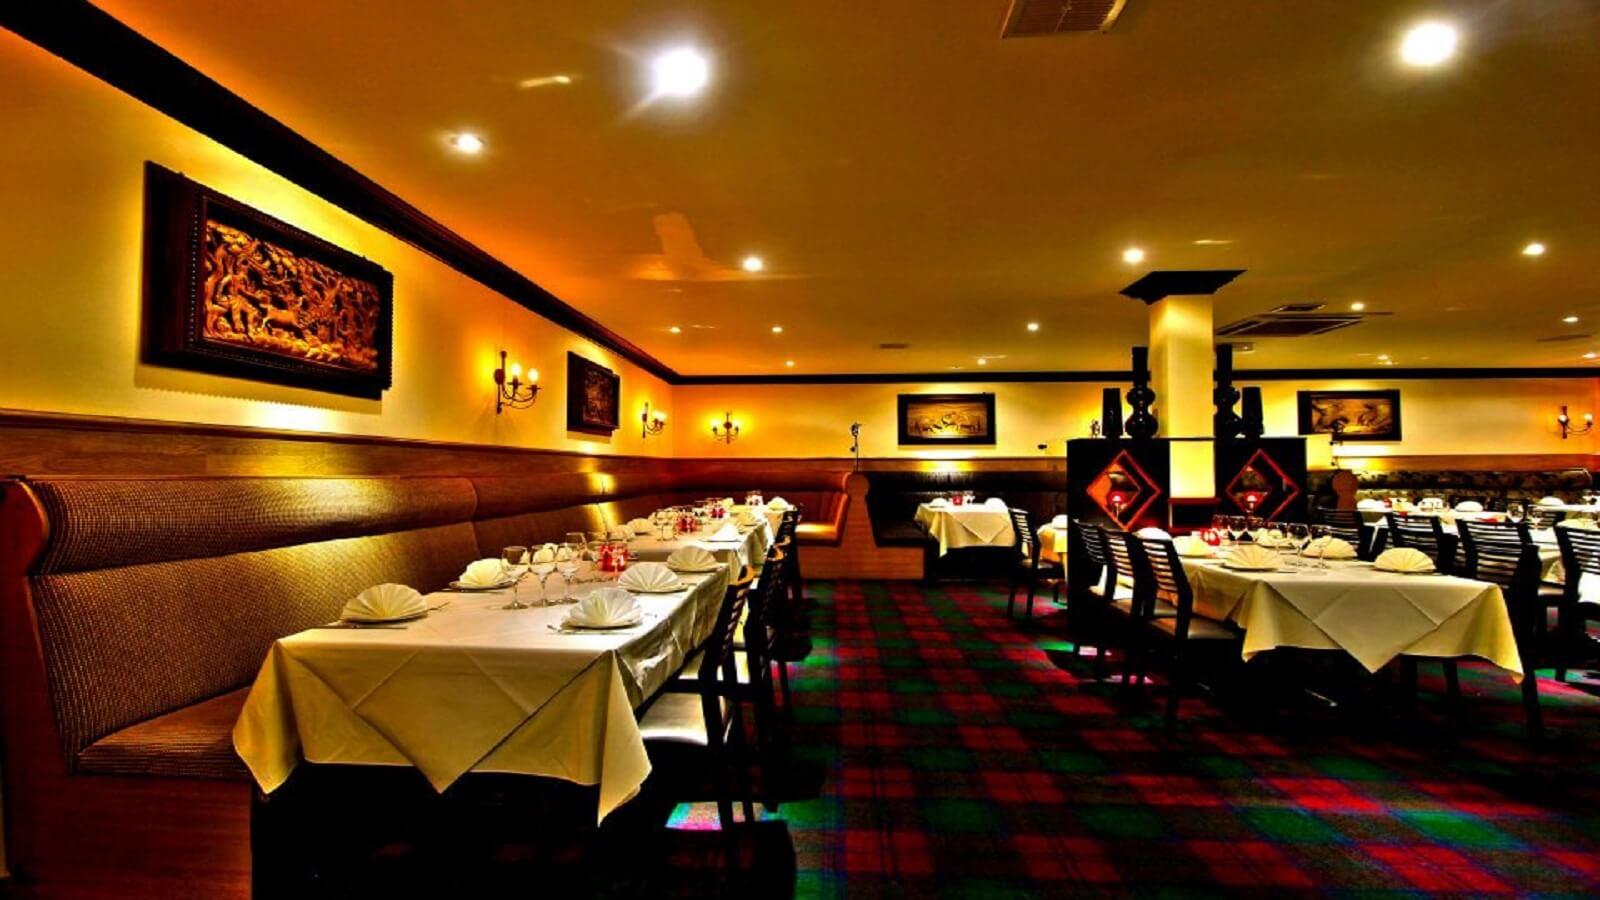 Cinnamon Indian Restaurant